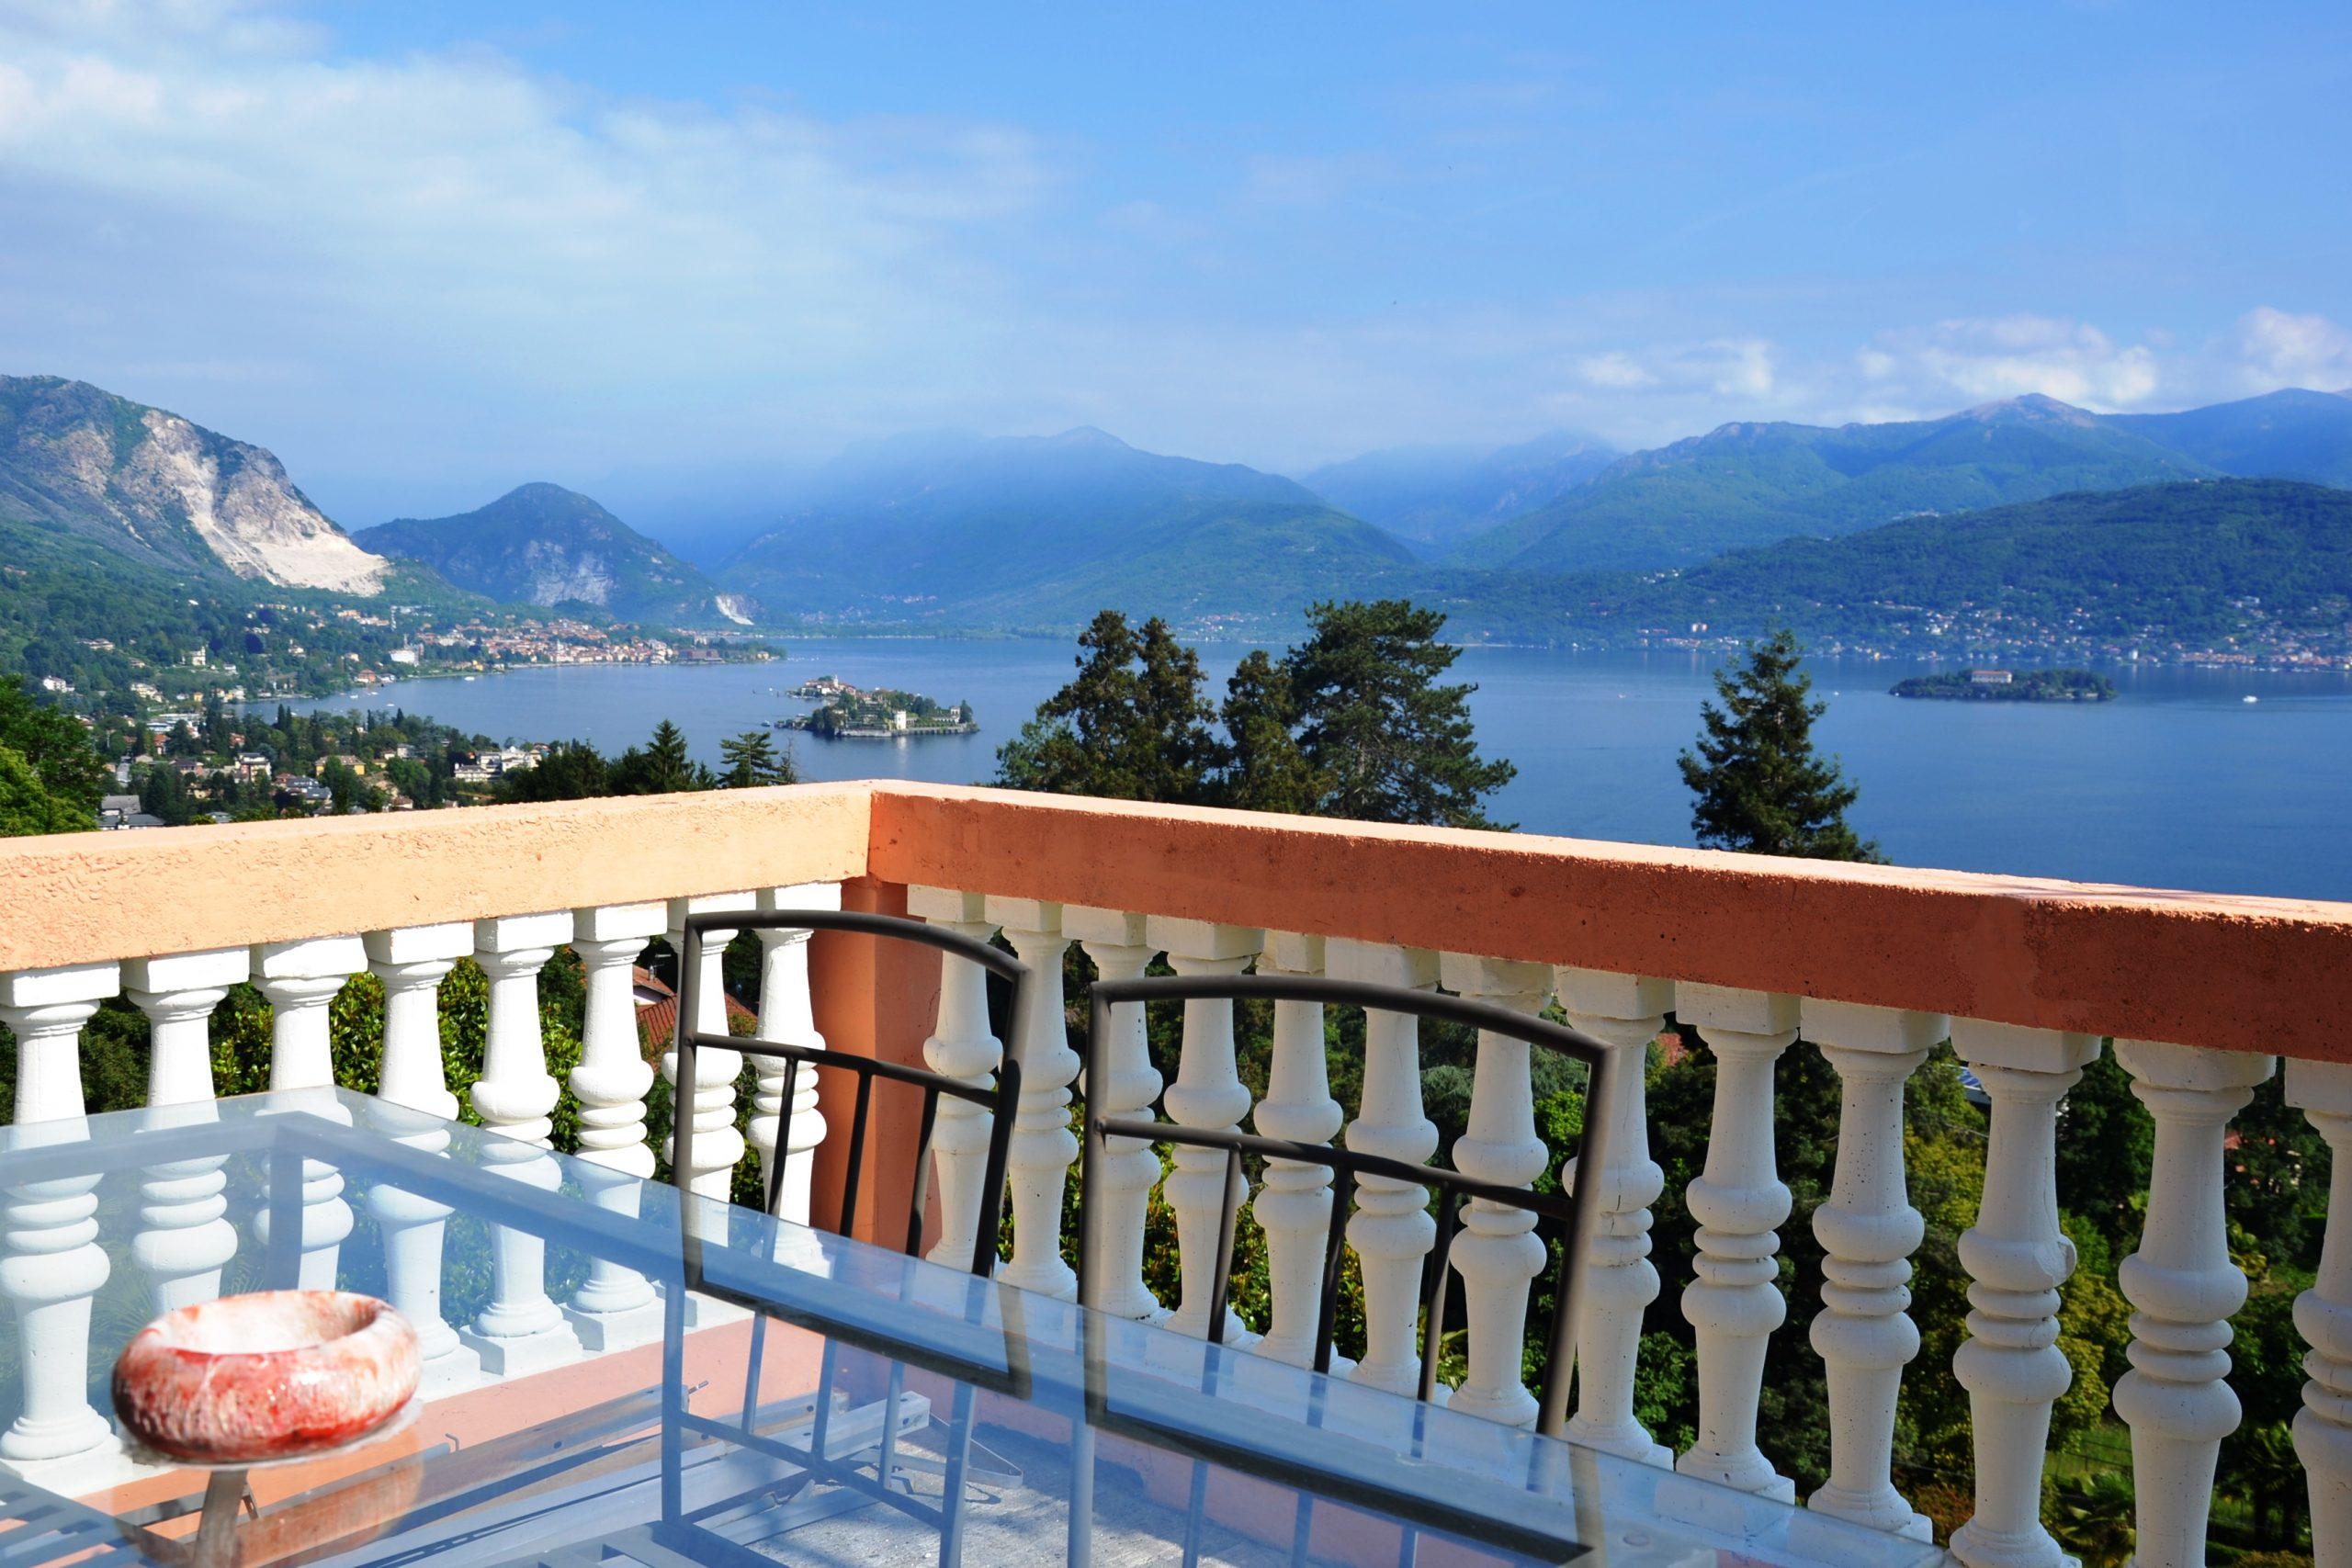 Villa storica con splendida vista lago e parco, Stresa